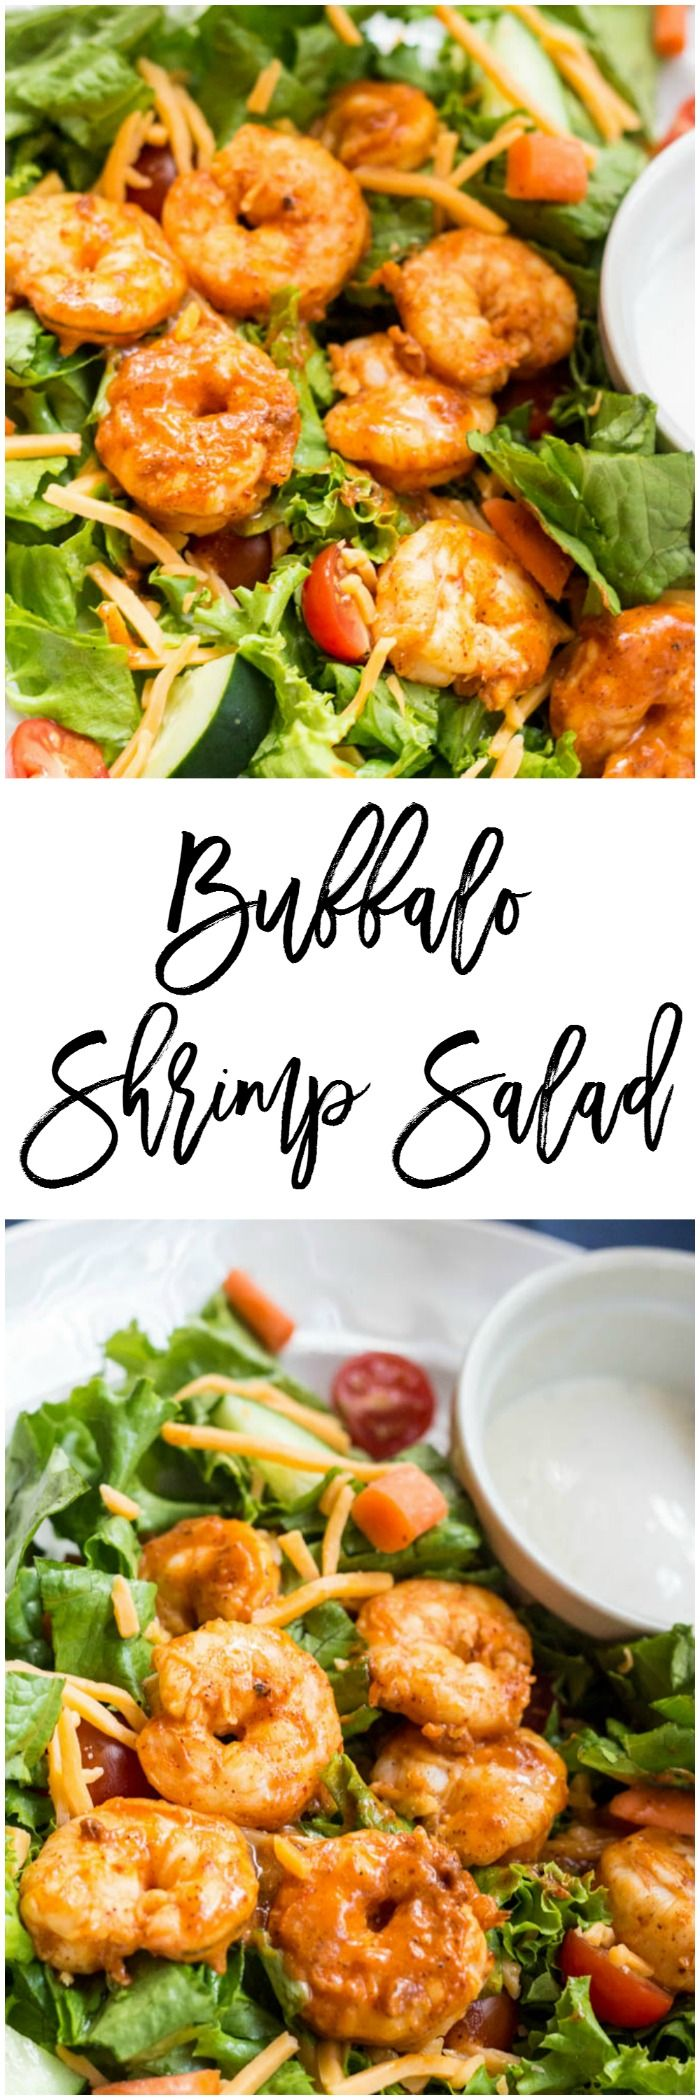 Buffalo Shrimp Salad | Dash of Herbs